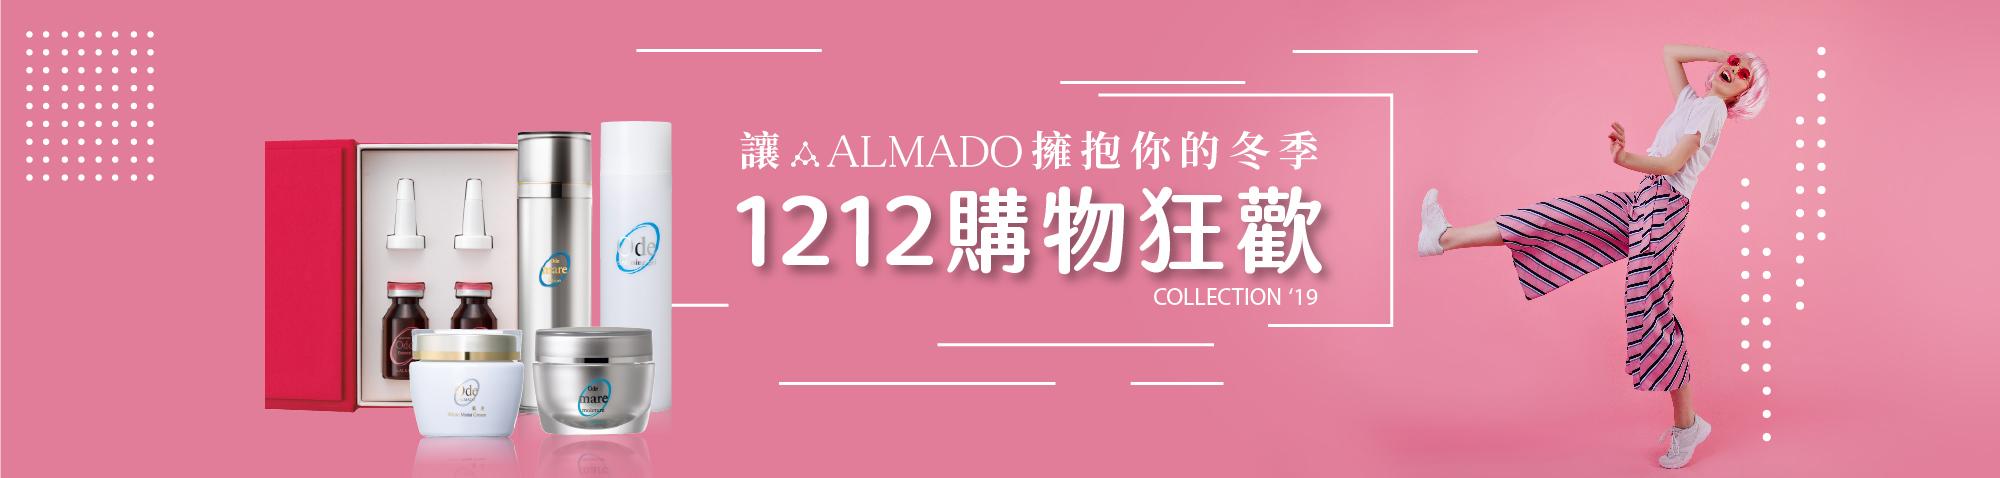 1212-ALMADO購物優惠